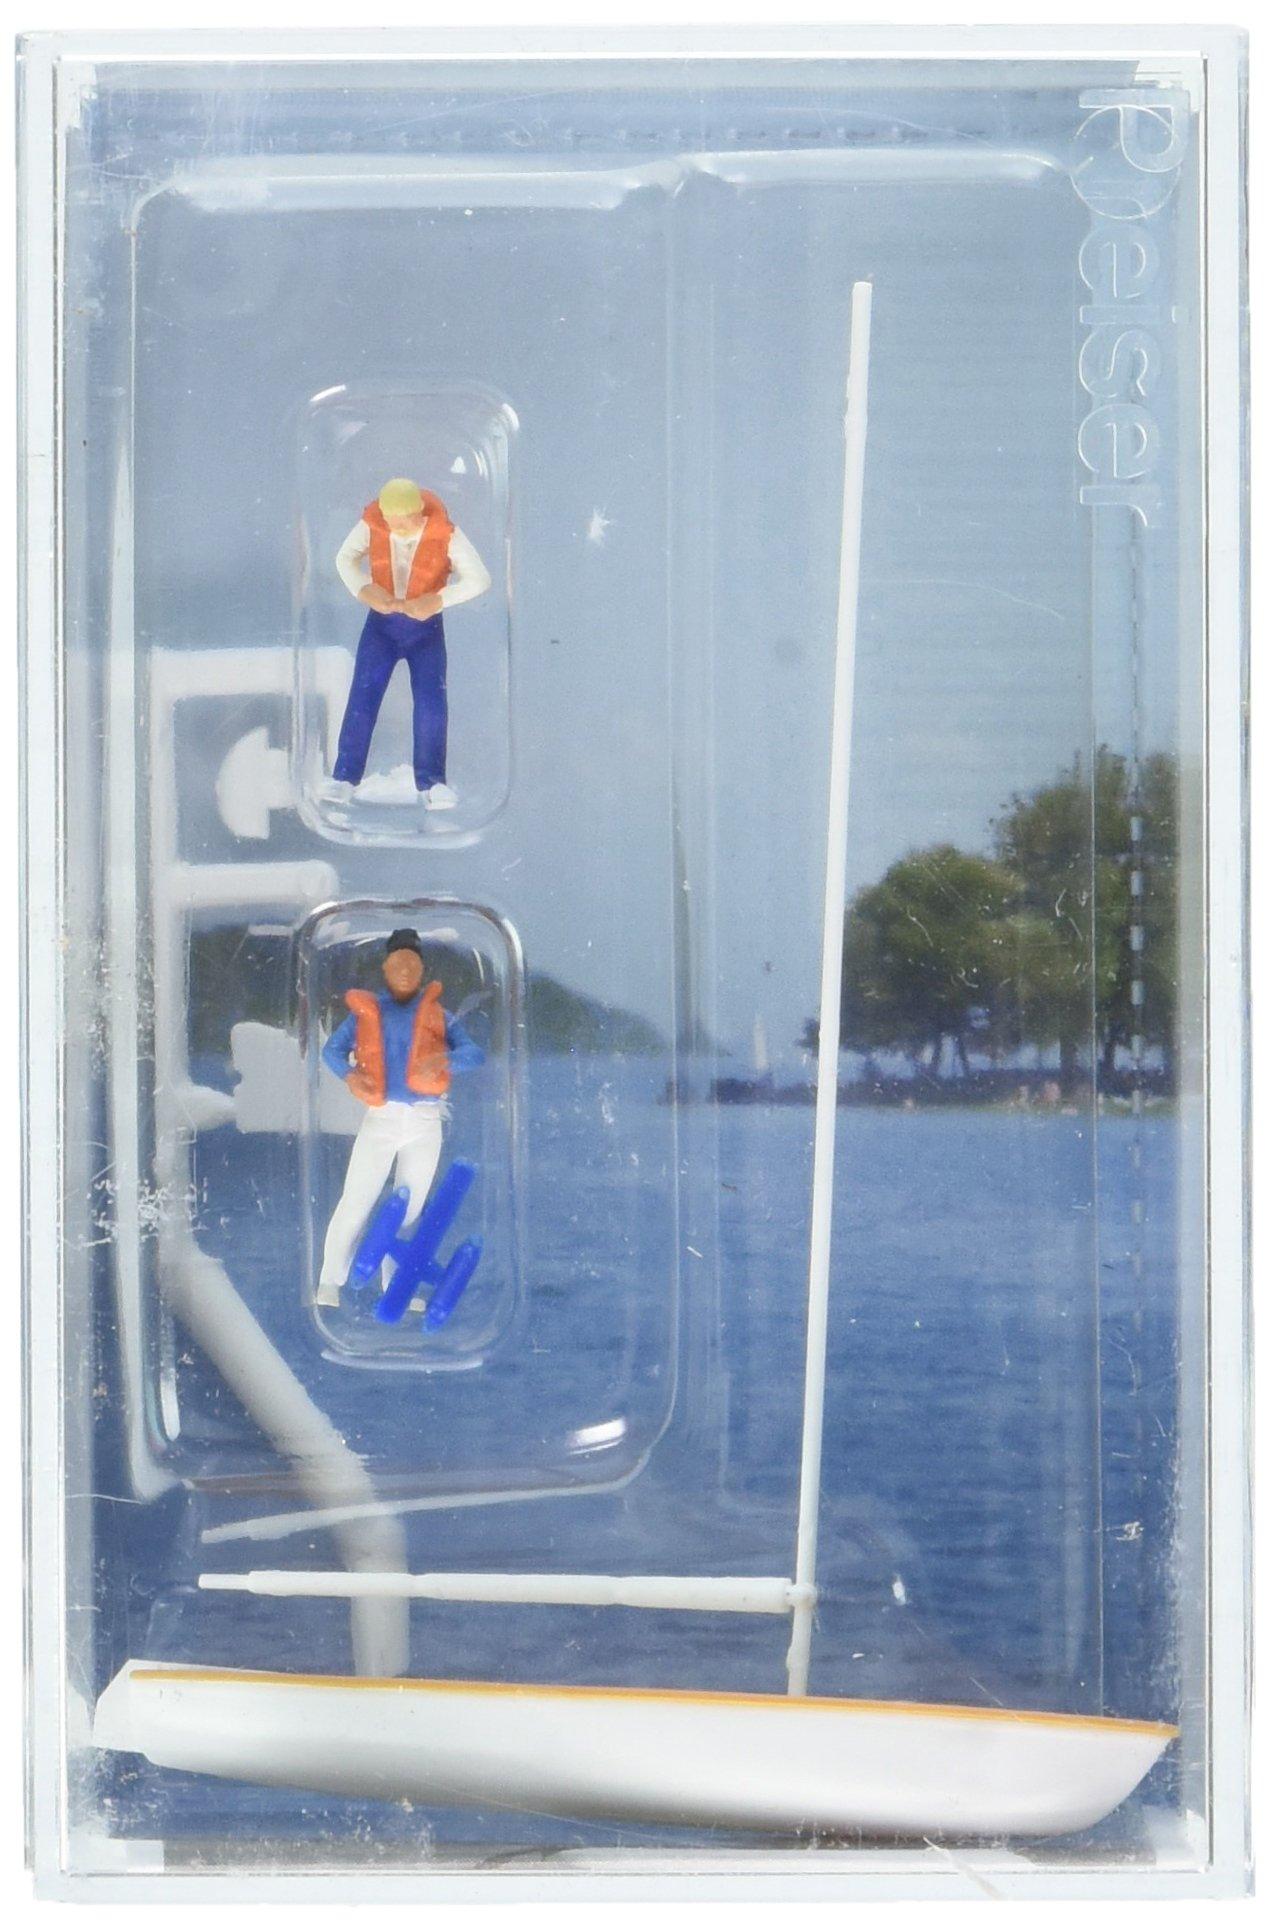 Preiser 10678 Korsar Sailboat w/2 Sailors Putting On Life Jackets Sails Down (White, Yellow) HO Scale Figure